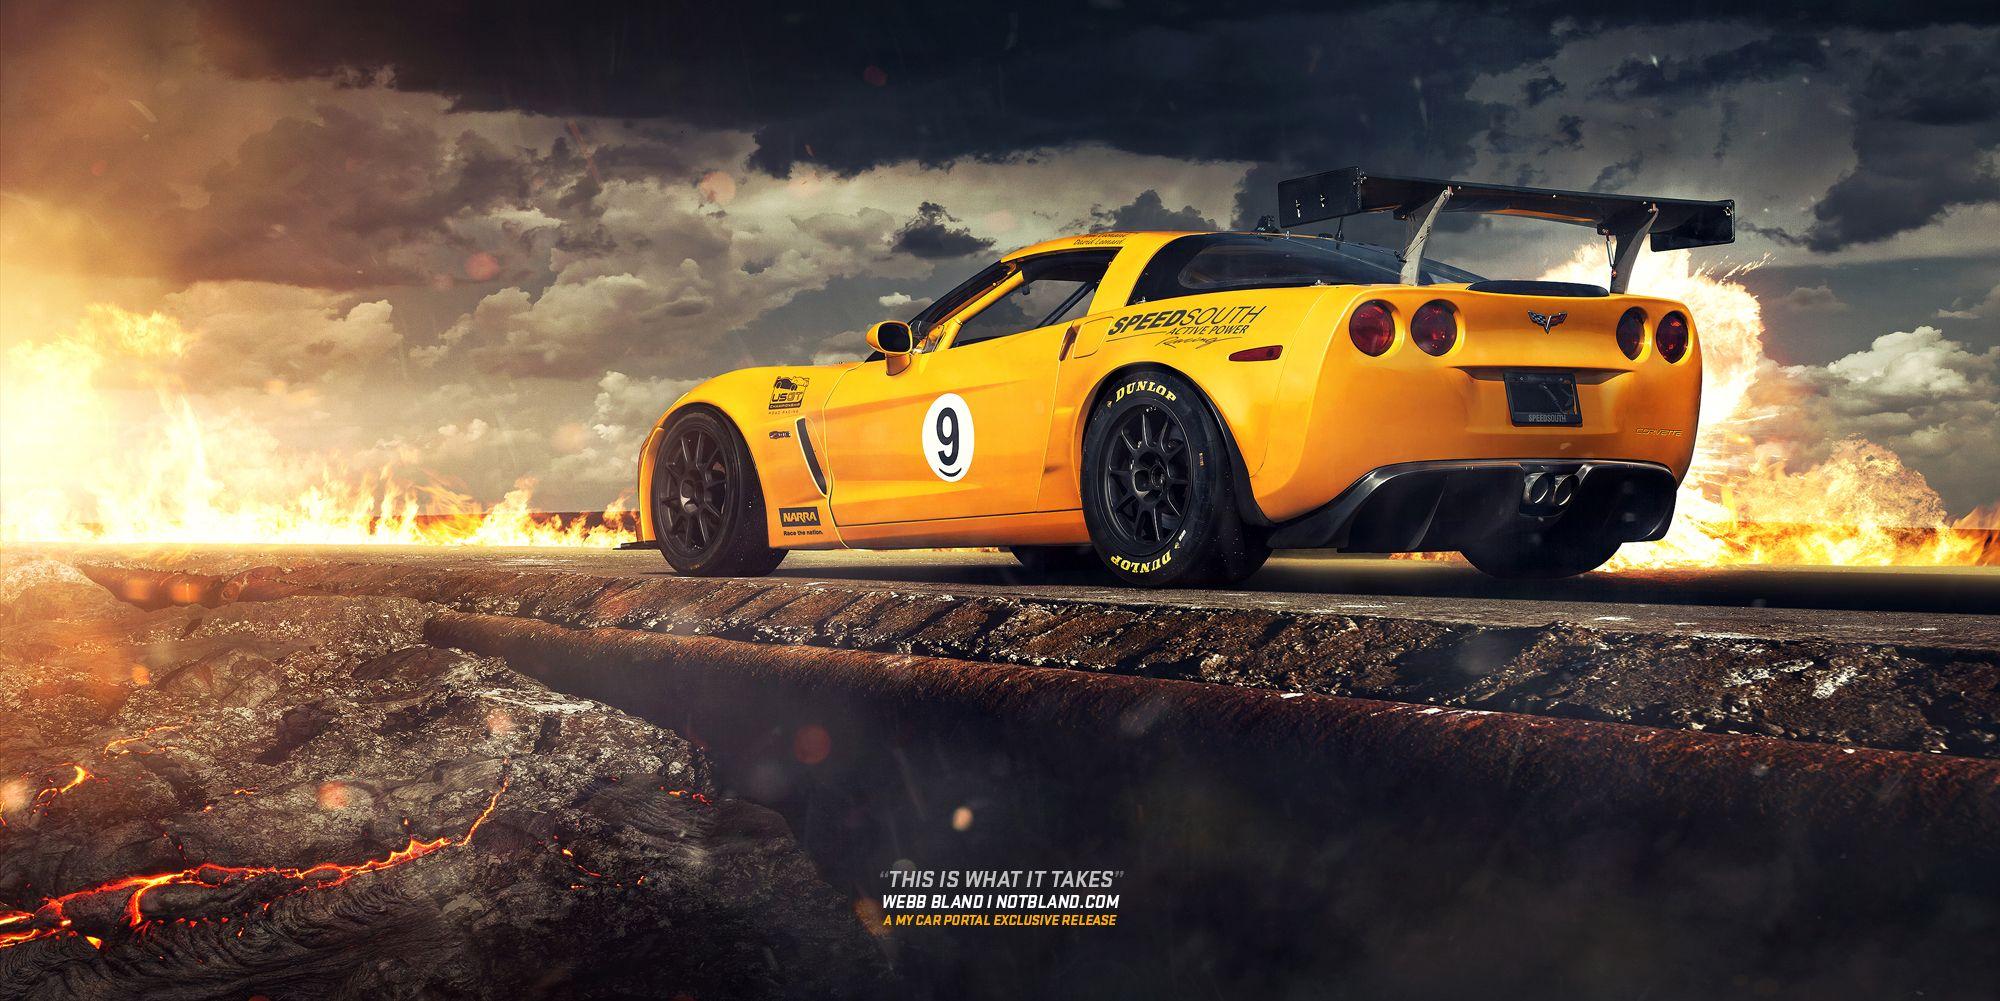 Corvette Wallpaper By NotBland Automotive graphy